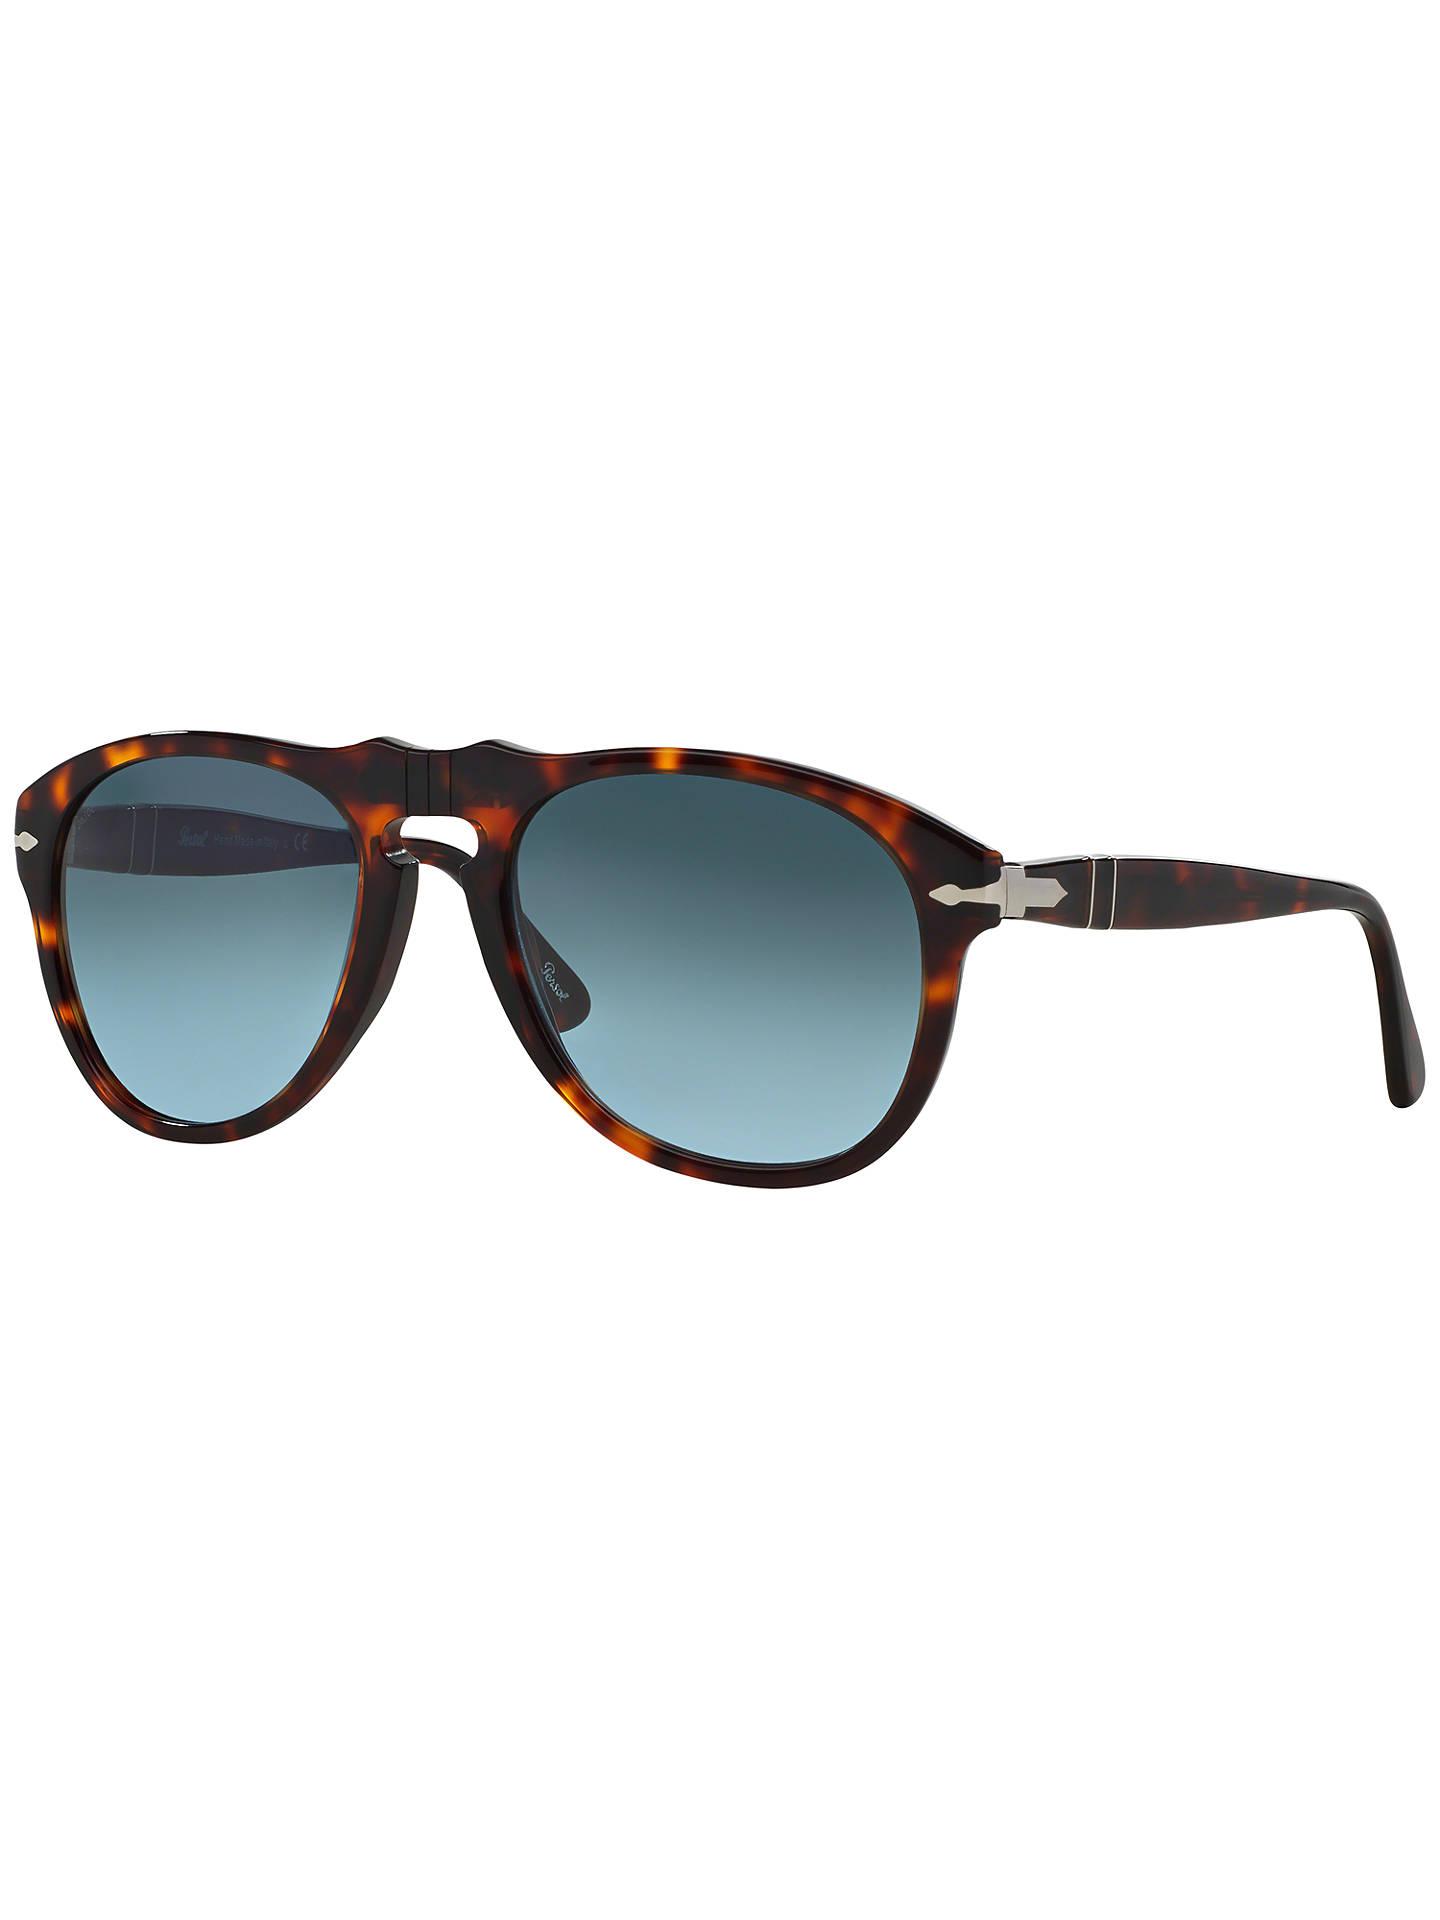 9788b3729f Persol PO0649 Aviator Sunglasses at John Lewis   Partners